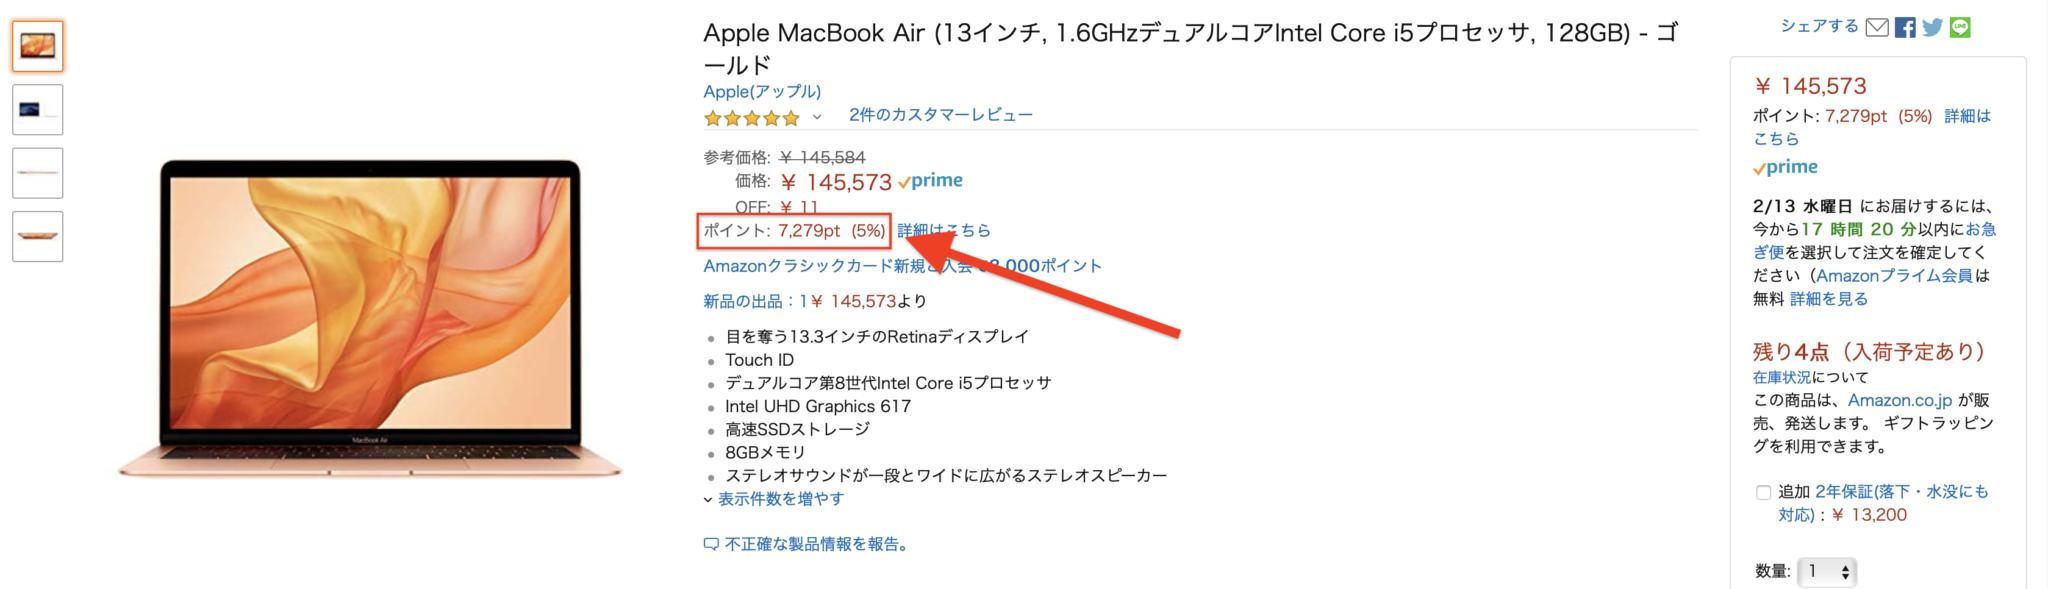 Amazonで販売れているMacBookAir2018年モデル